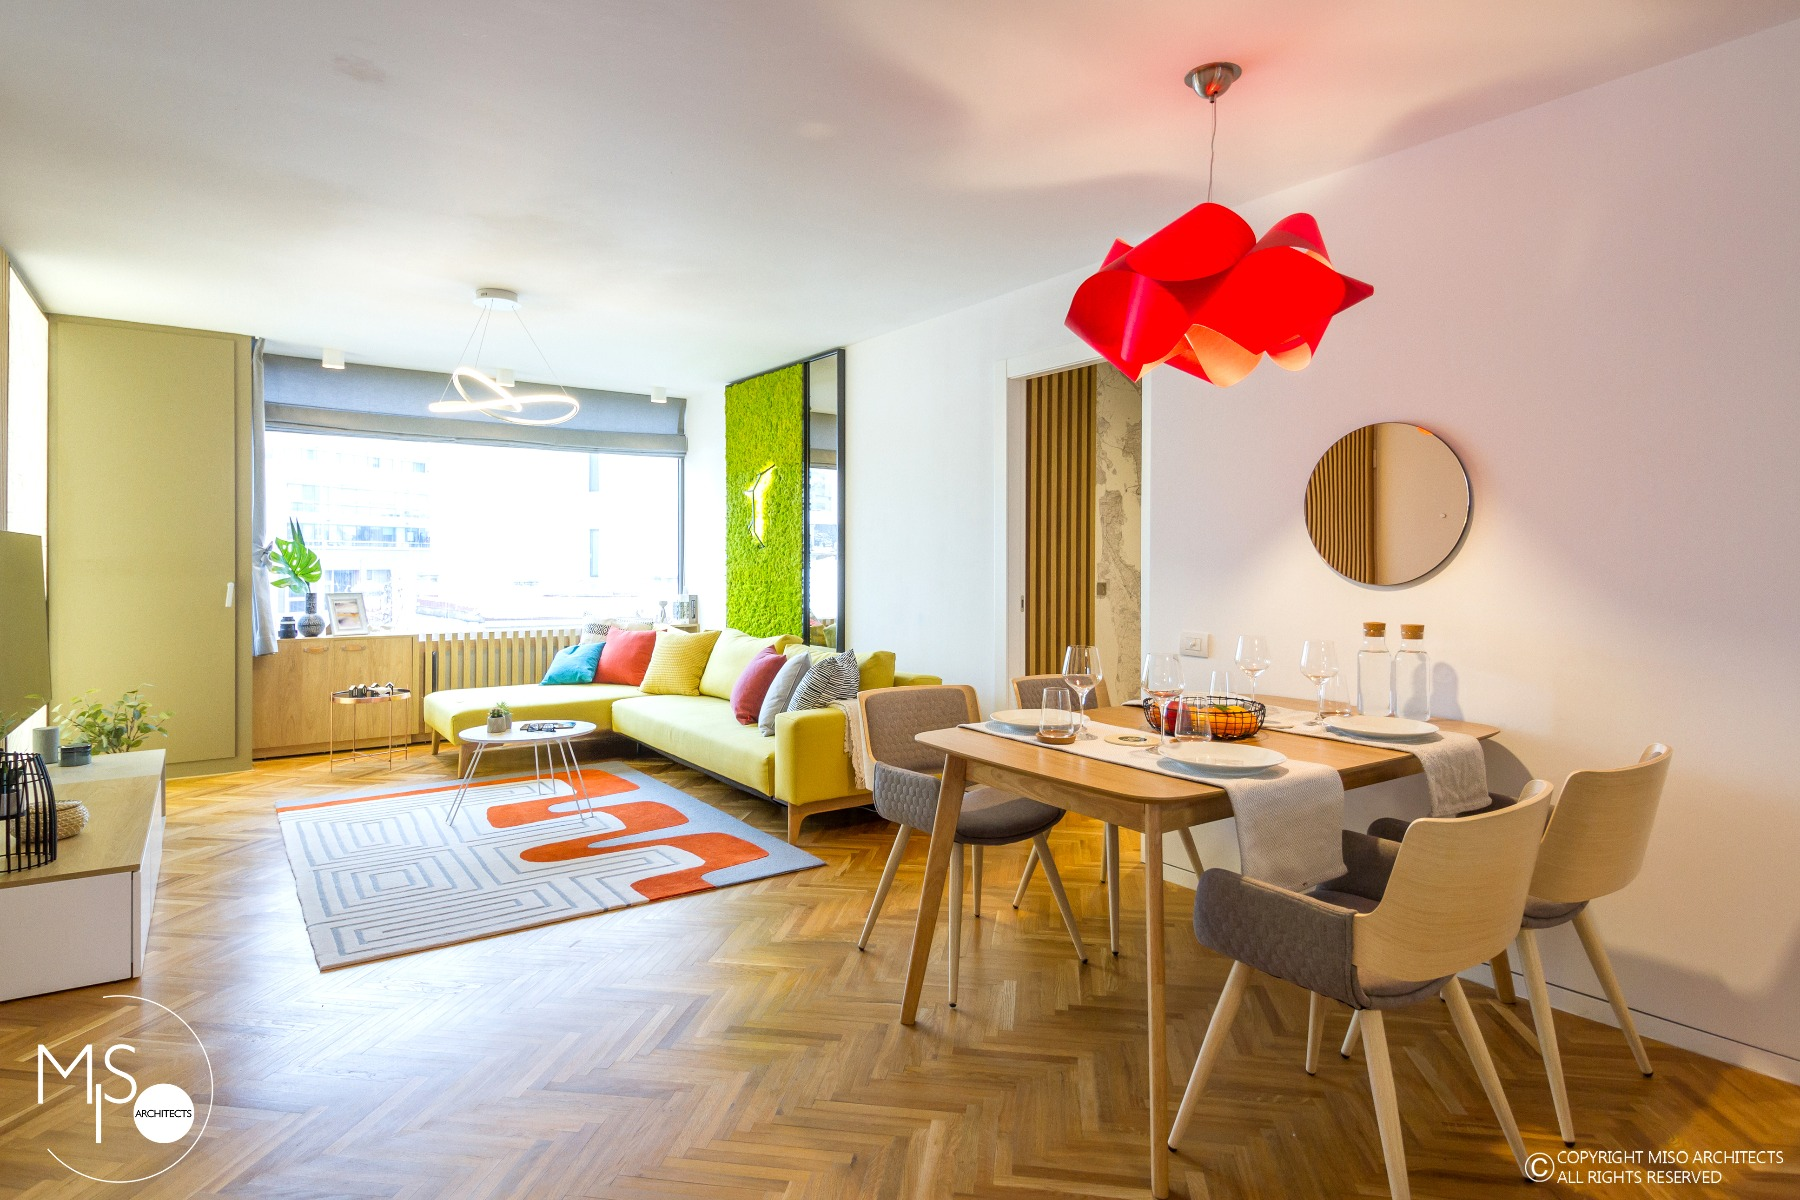 Apartament viu colorat